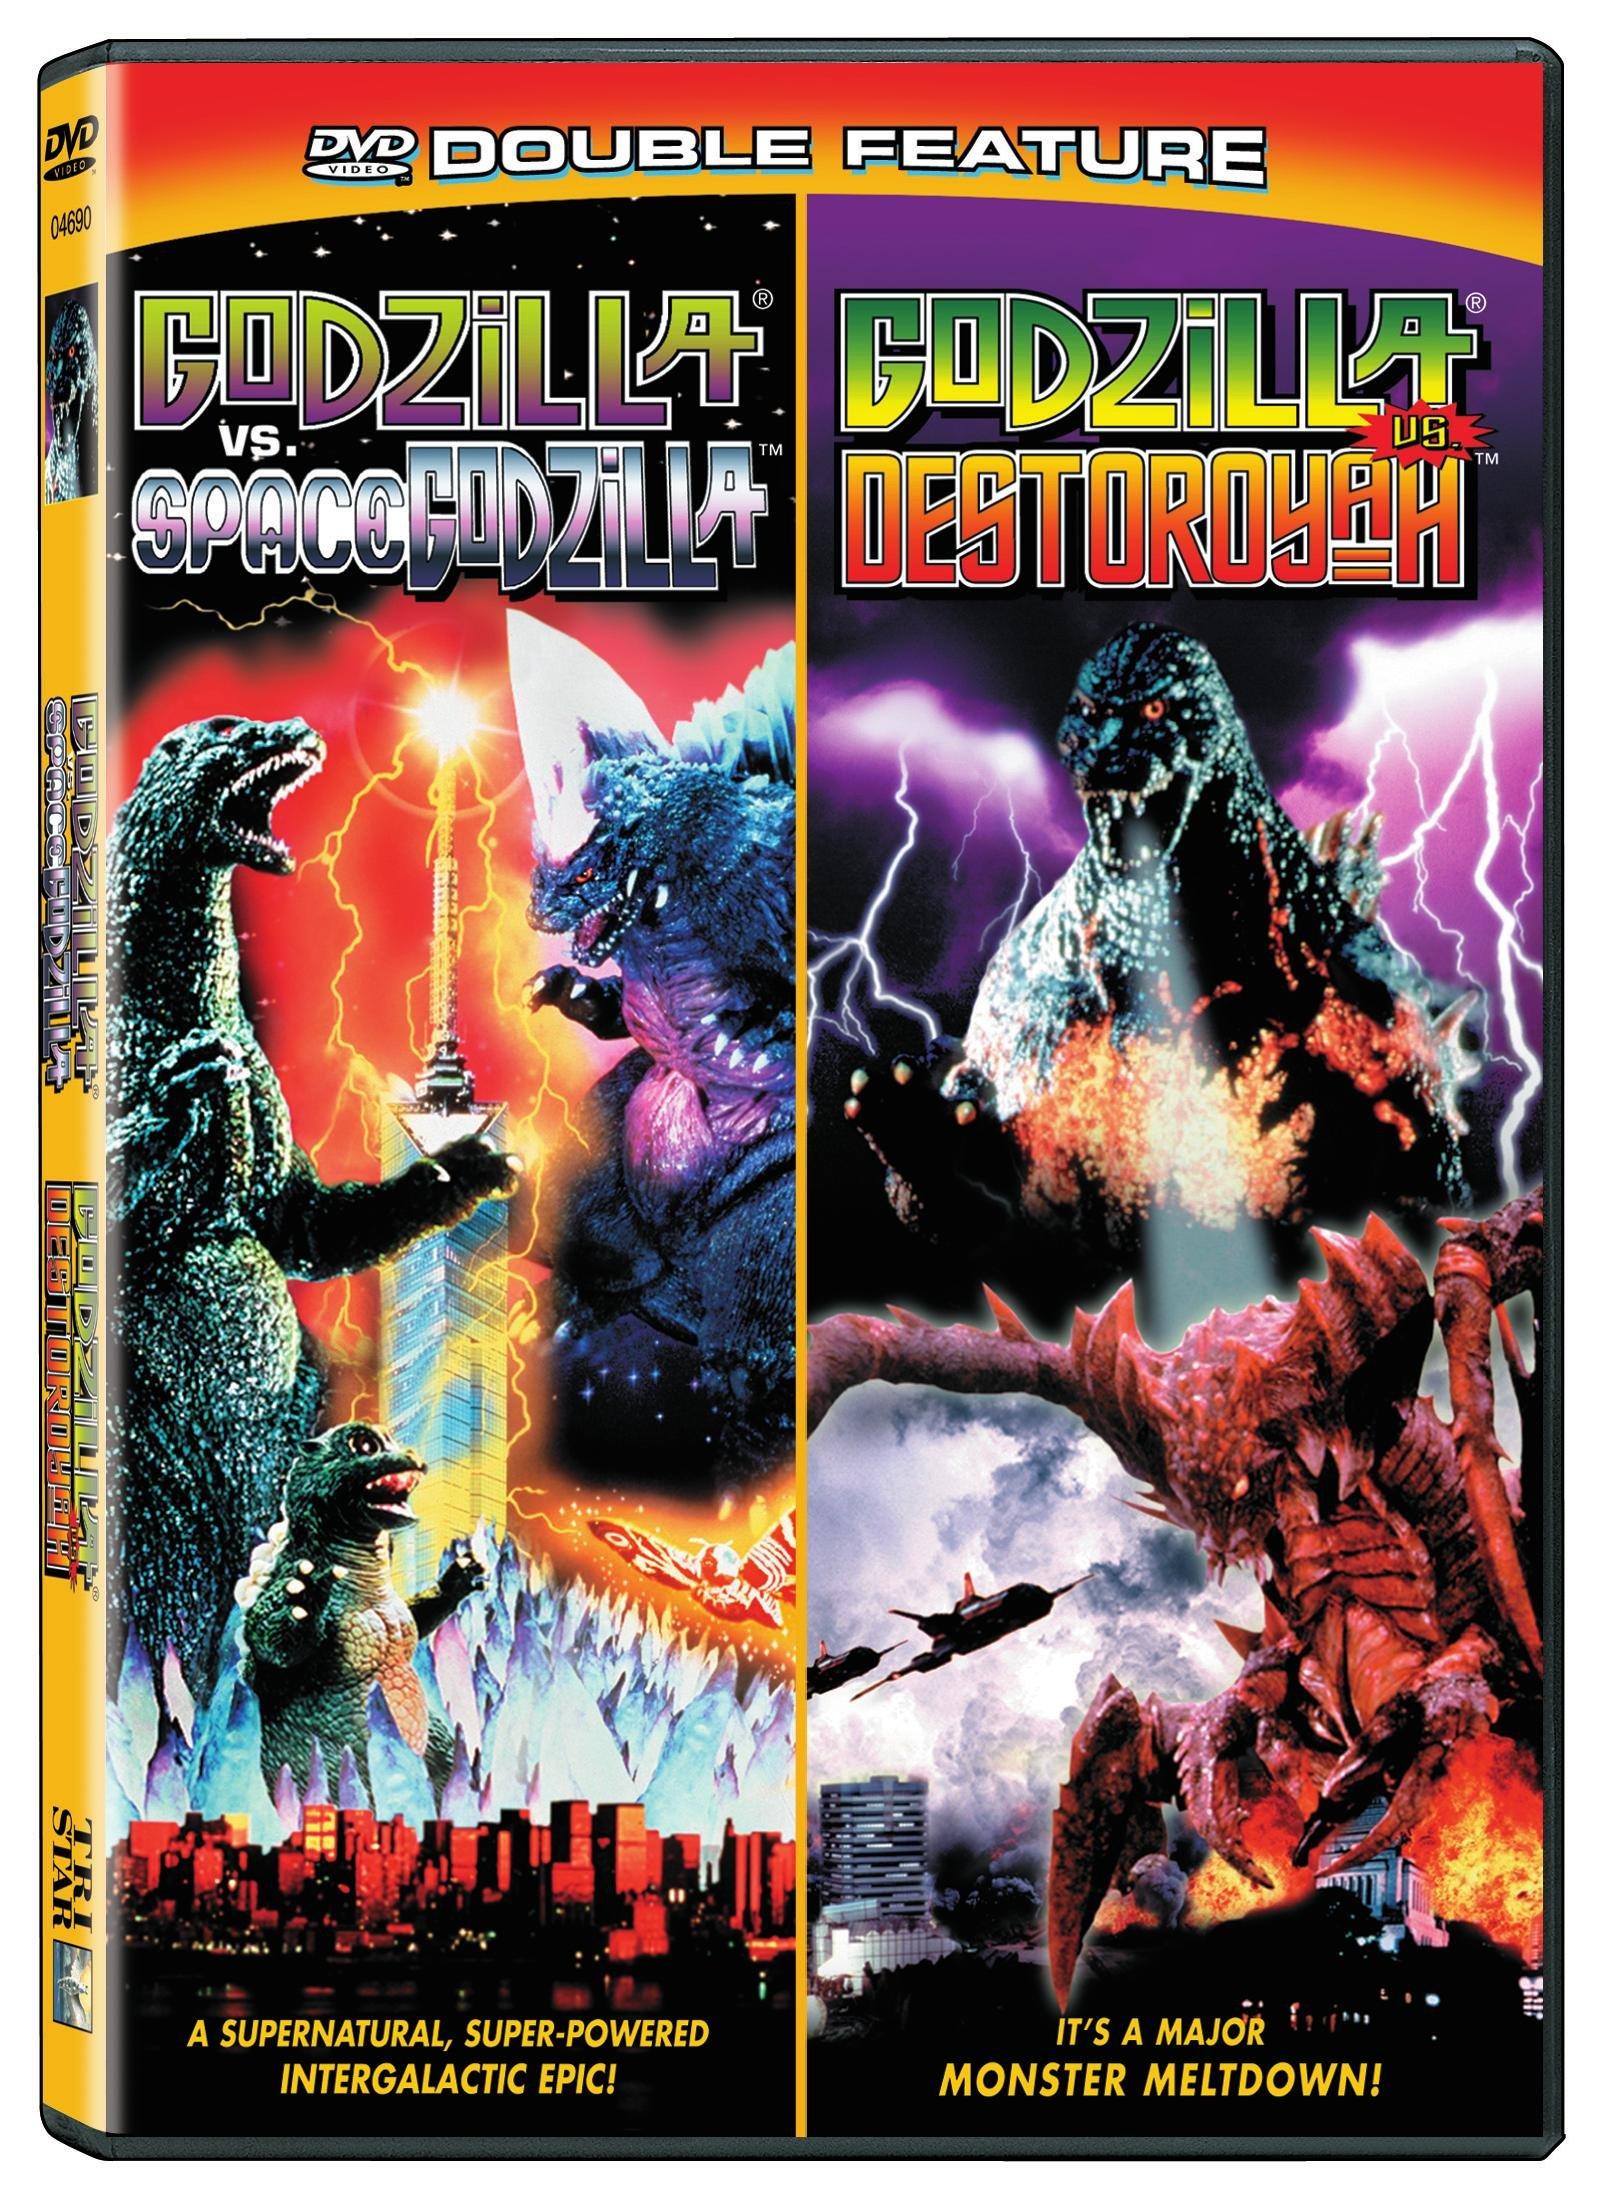 Godzilla vs. Destoroyah/Vs Spacegodzilla (DVD)